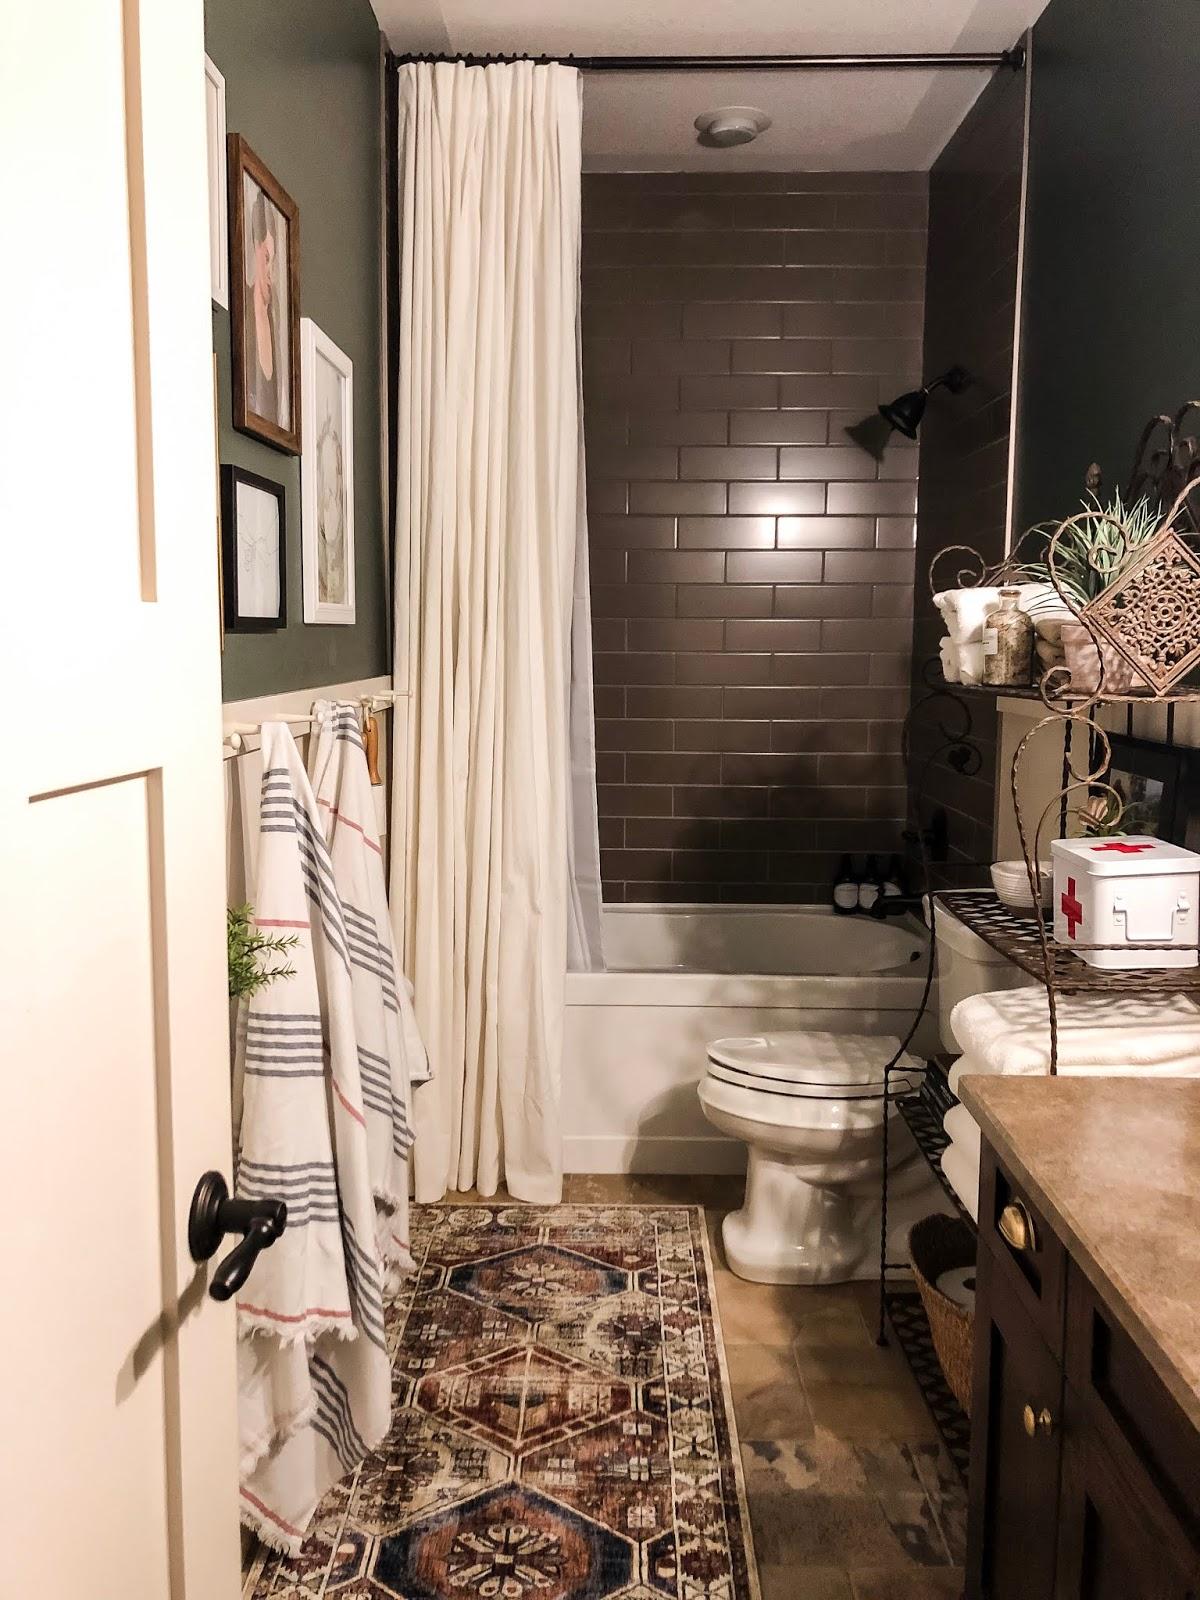 Raise the shower curtain to make bathroom feel bigger